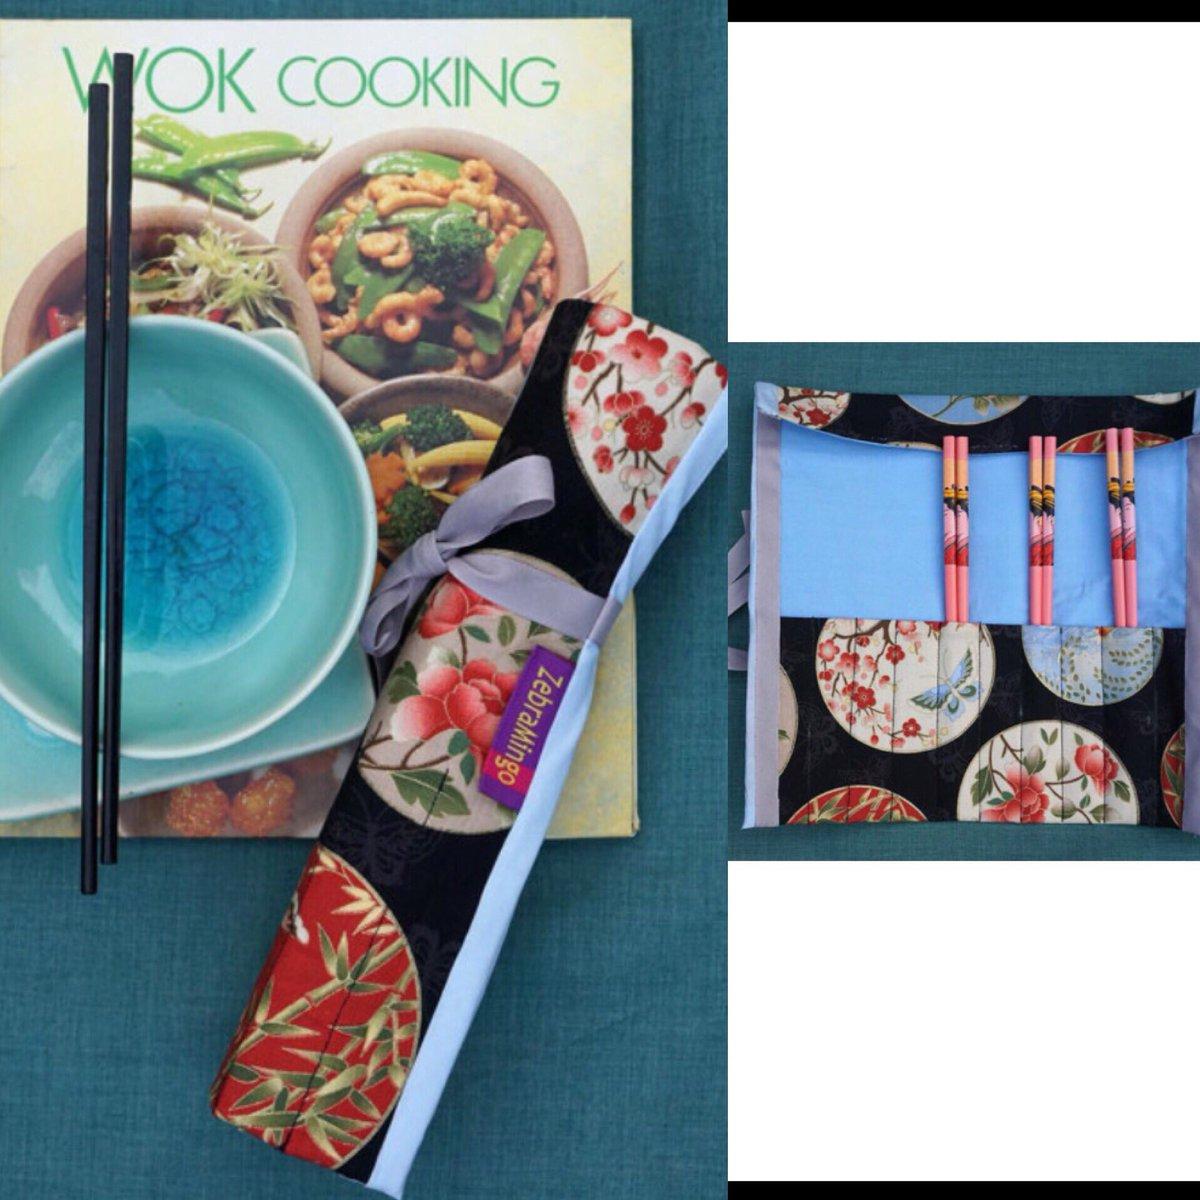 @WhatsNewRae #wnukrt #womeninbiz something new.. chopstick wrap! So fun to #give or get as a #gift. #tidy #kitchen  http://www. zebramingo.co.uk  &nbsp;  <br>http://pic.twitter.com/YsZnGxPvNO